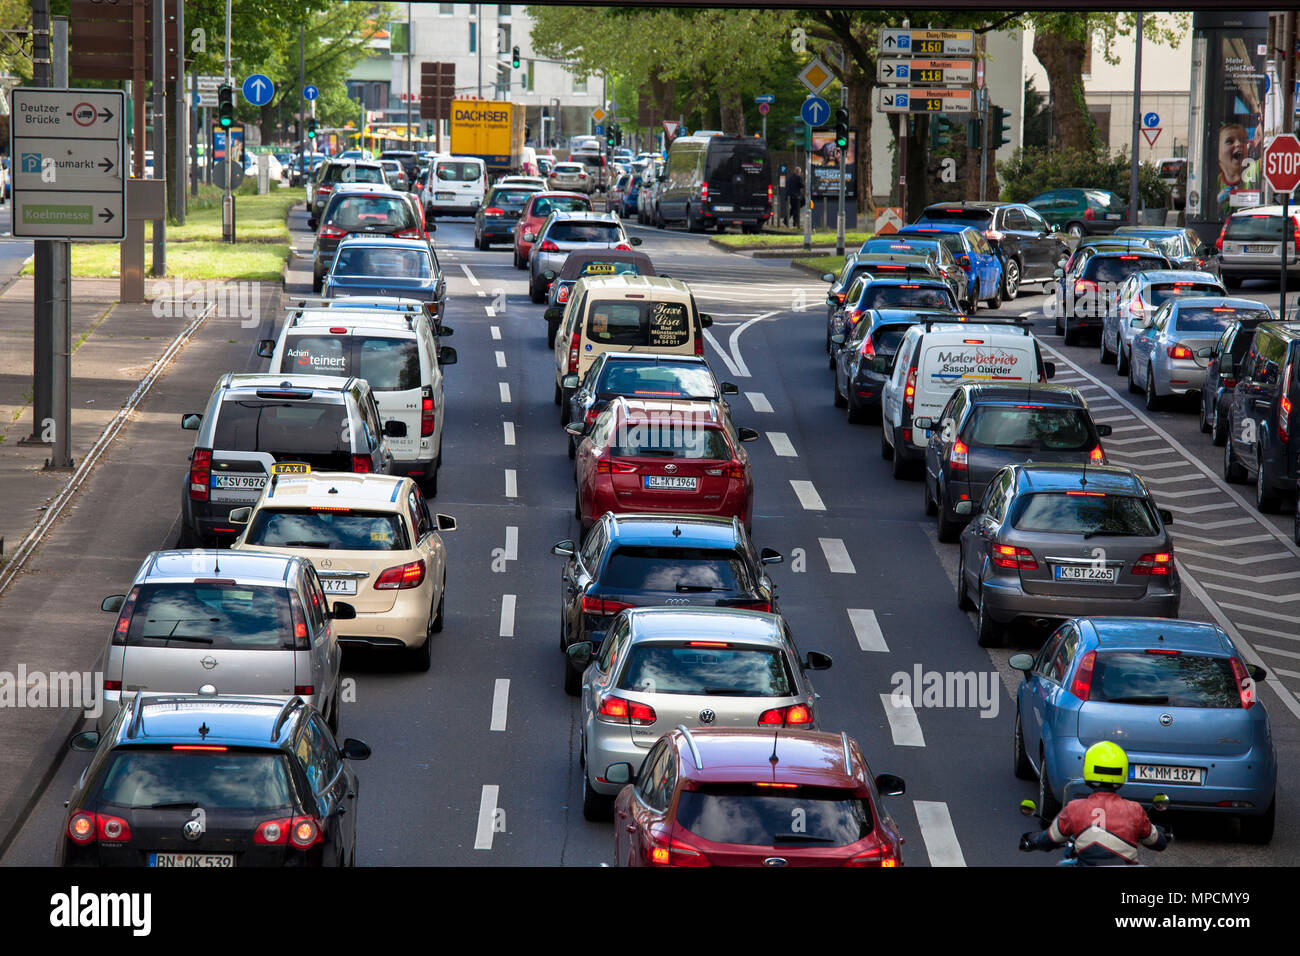 Europe, Germany, Cologne, traffic jam on the Rheinufer street, exit from the Rheinufer tunnel heading south.  Europa, Deutschland, Koeln, Stau auf der - Stock Image